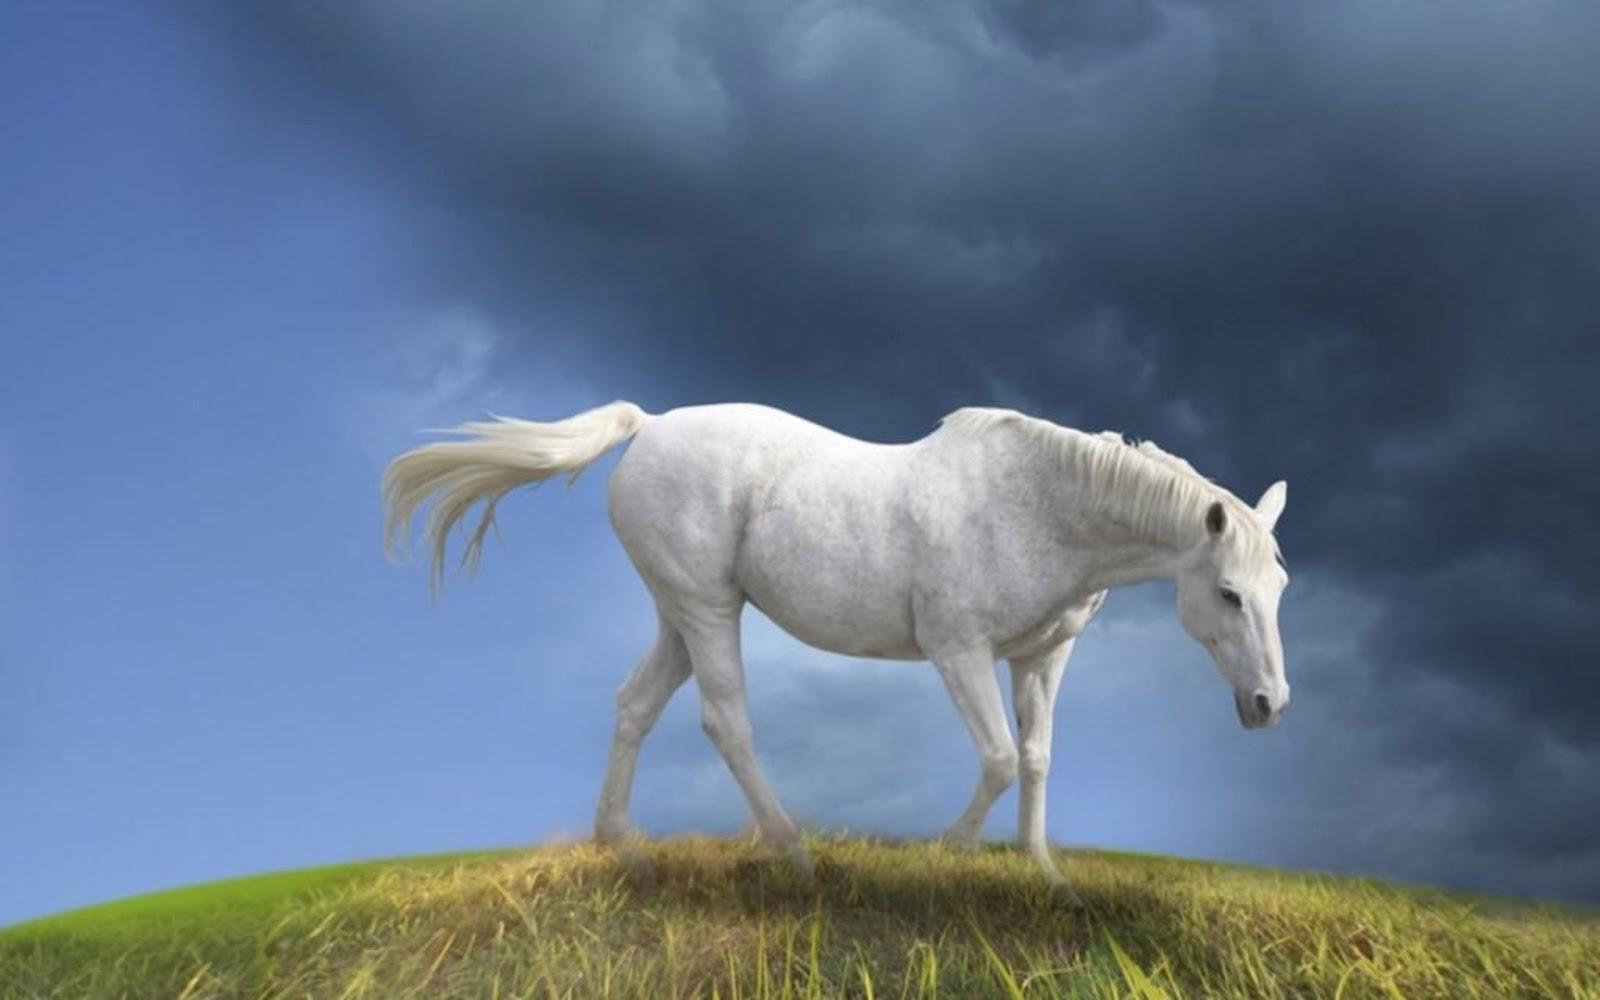 Great   Wallpaper Horse Creative - horse+eating+grees+hd+wallpaper  Photograph_672210.jpg